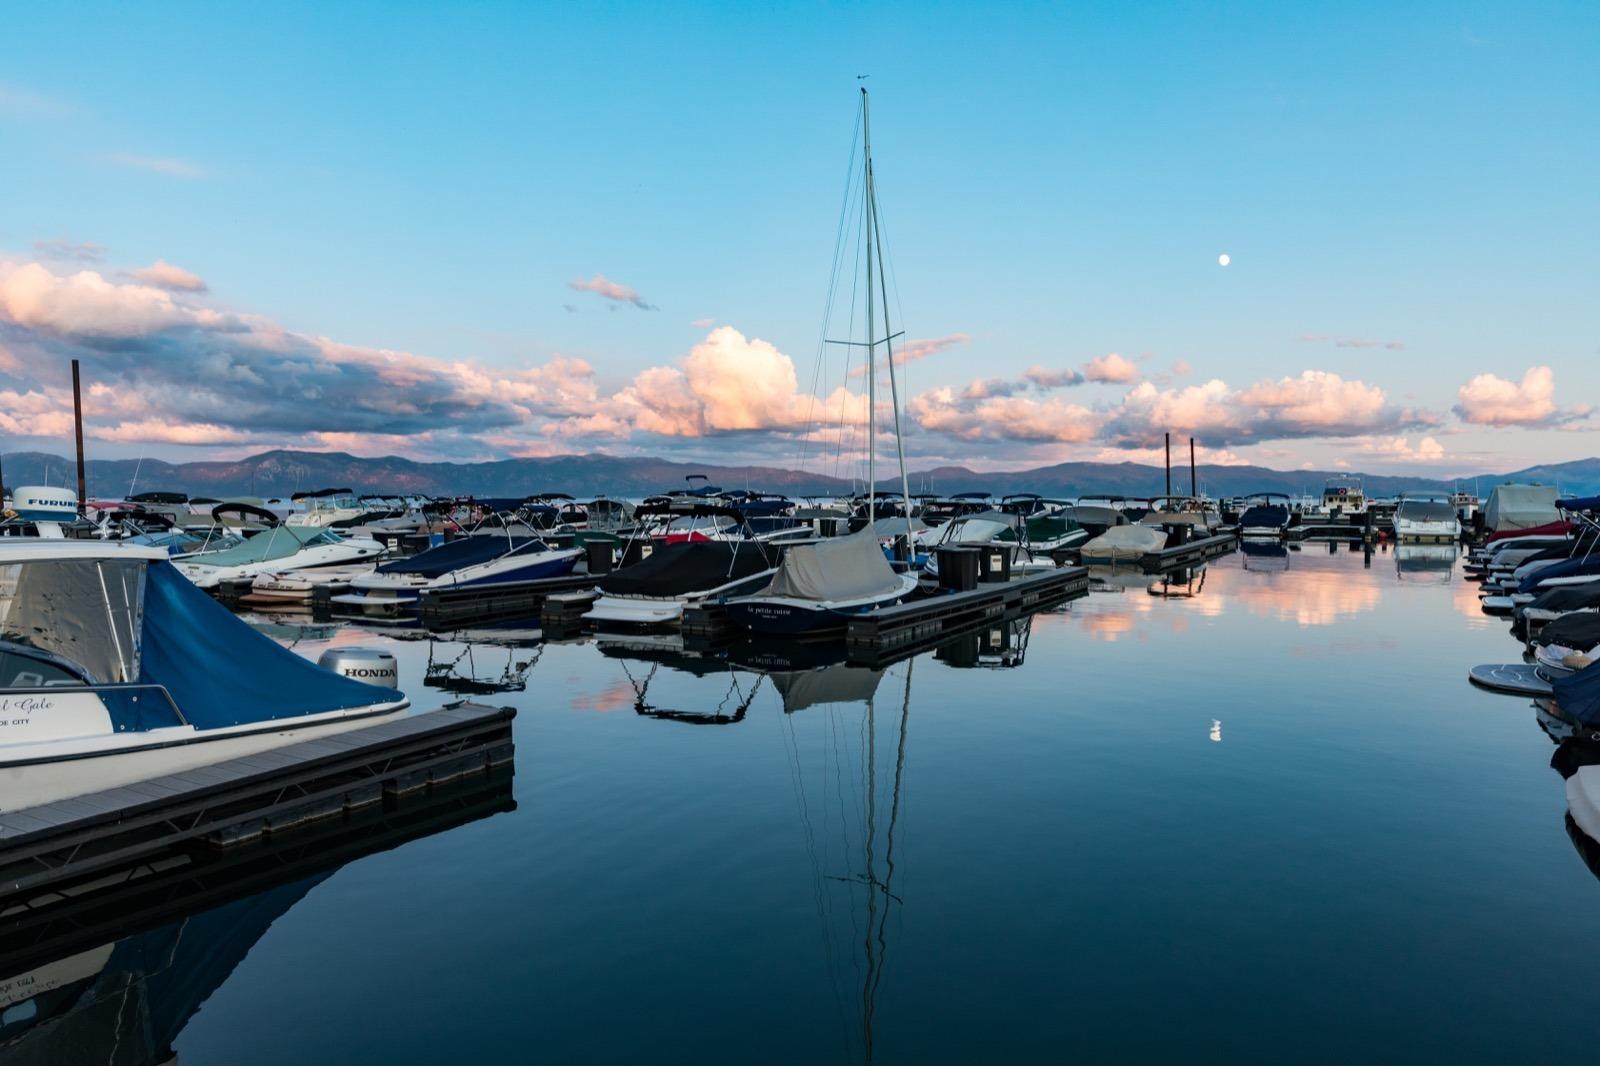 california-high-sierra-north-lake-tahoe-tahoe-city-marina